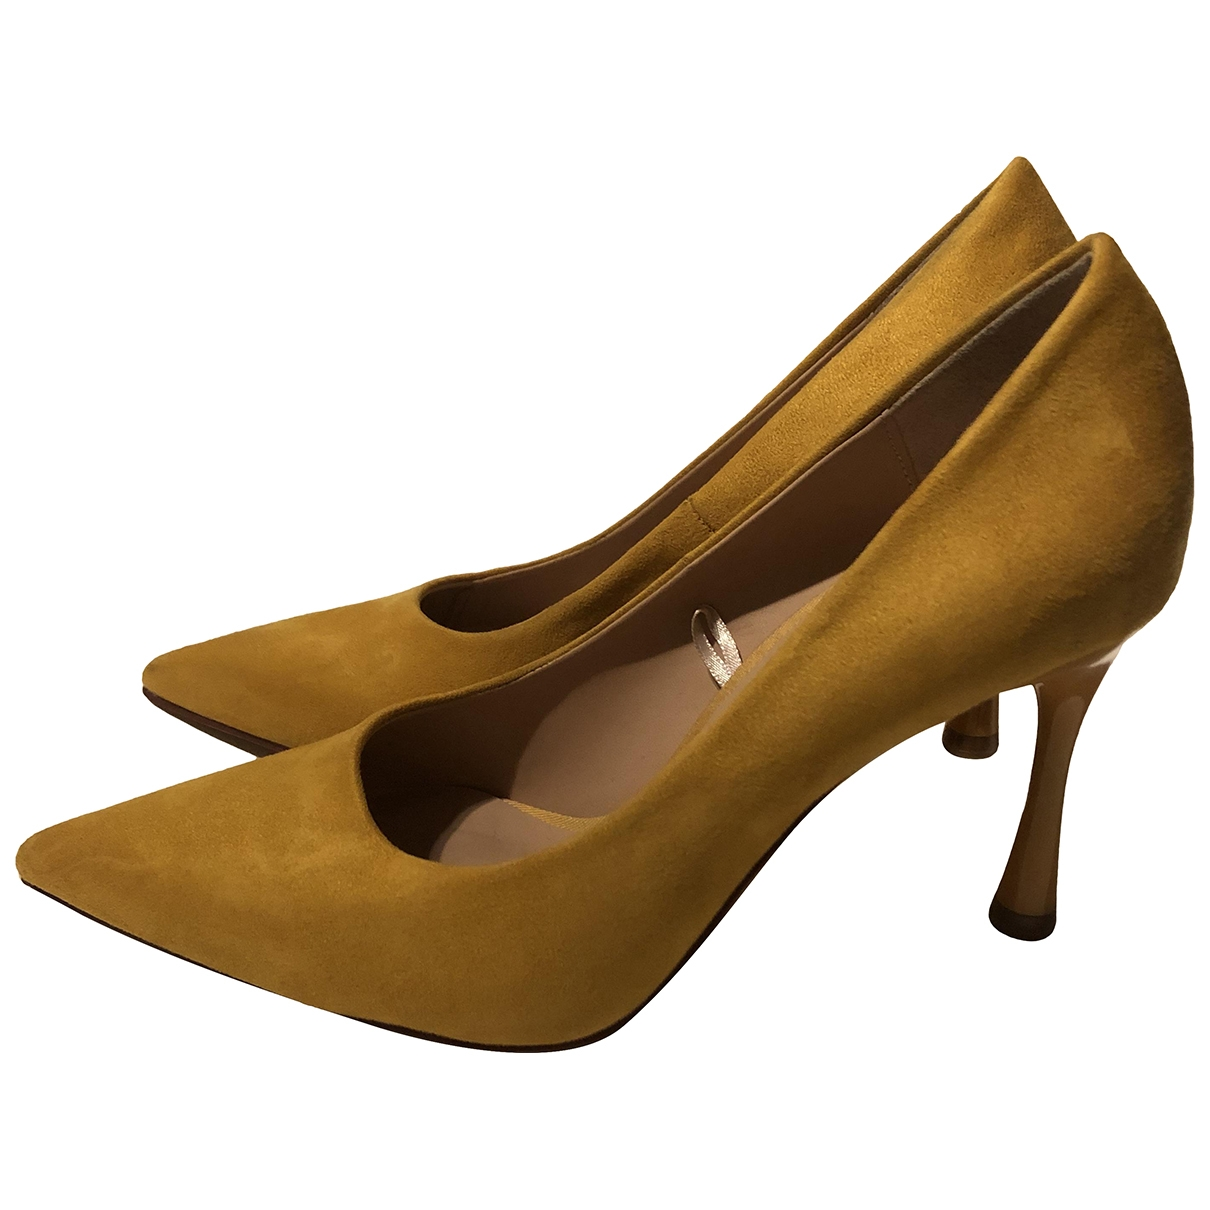 Zara - Escarpins   pour femme en suede - jaune